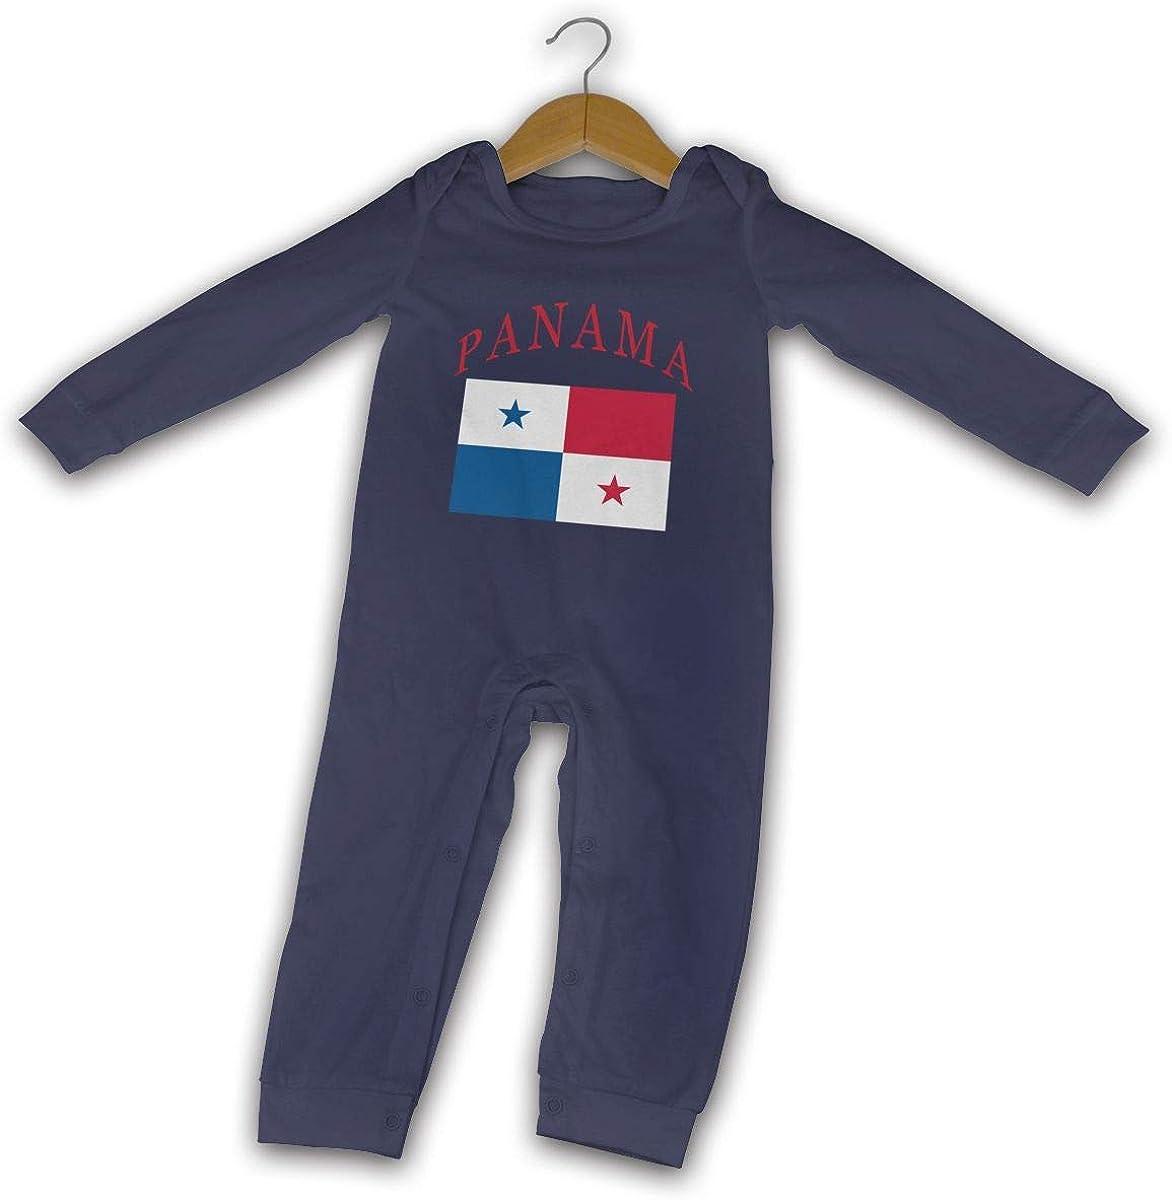 Eat Sleep Hockey Repeat Infant Baby Girl Boy Romper Jumpsuit Long Sleeve Bodysuit Tops Clothes